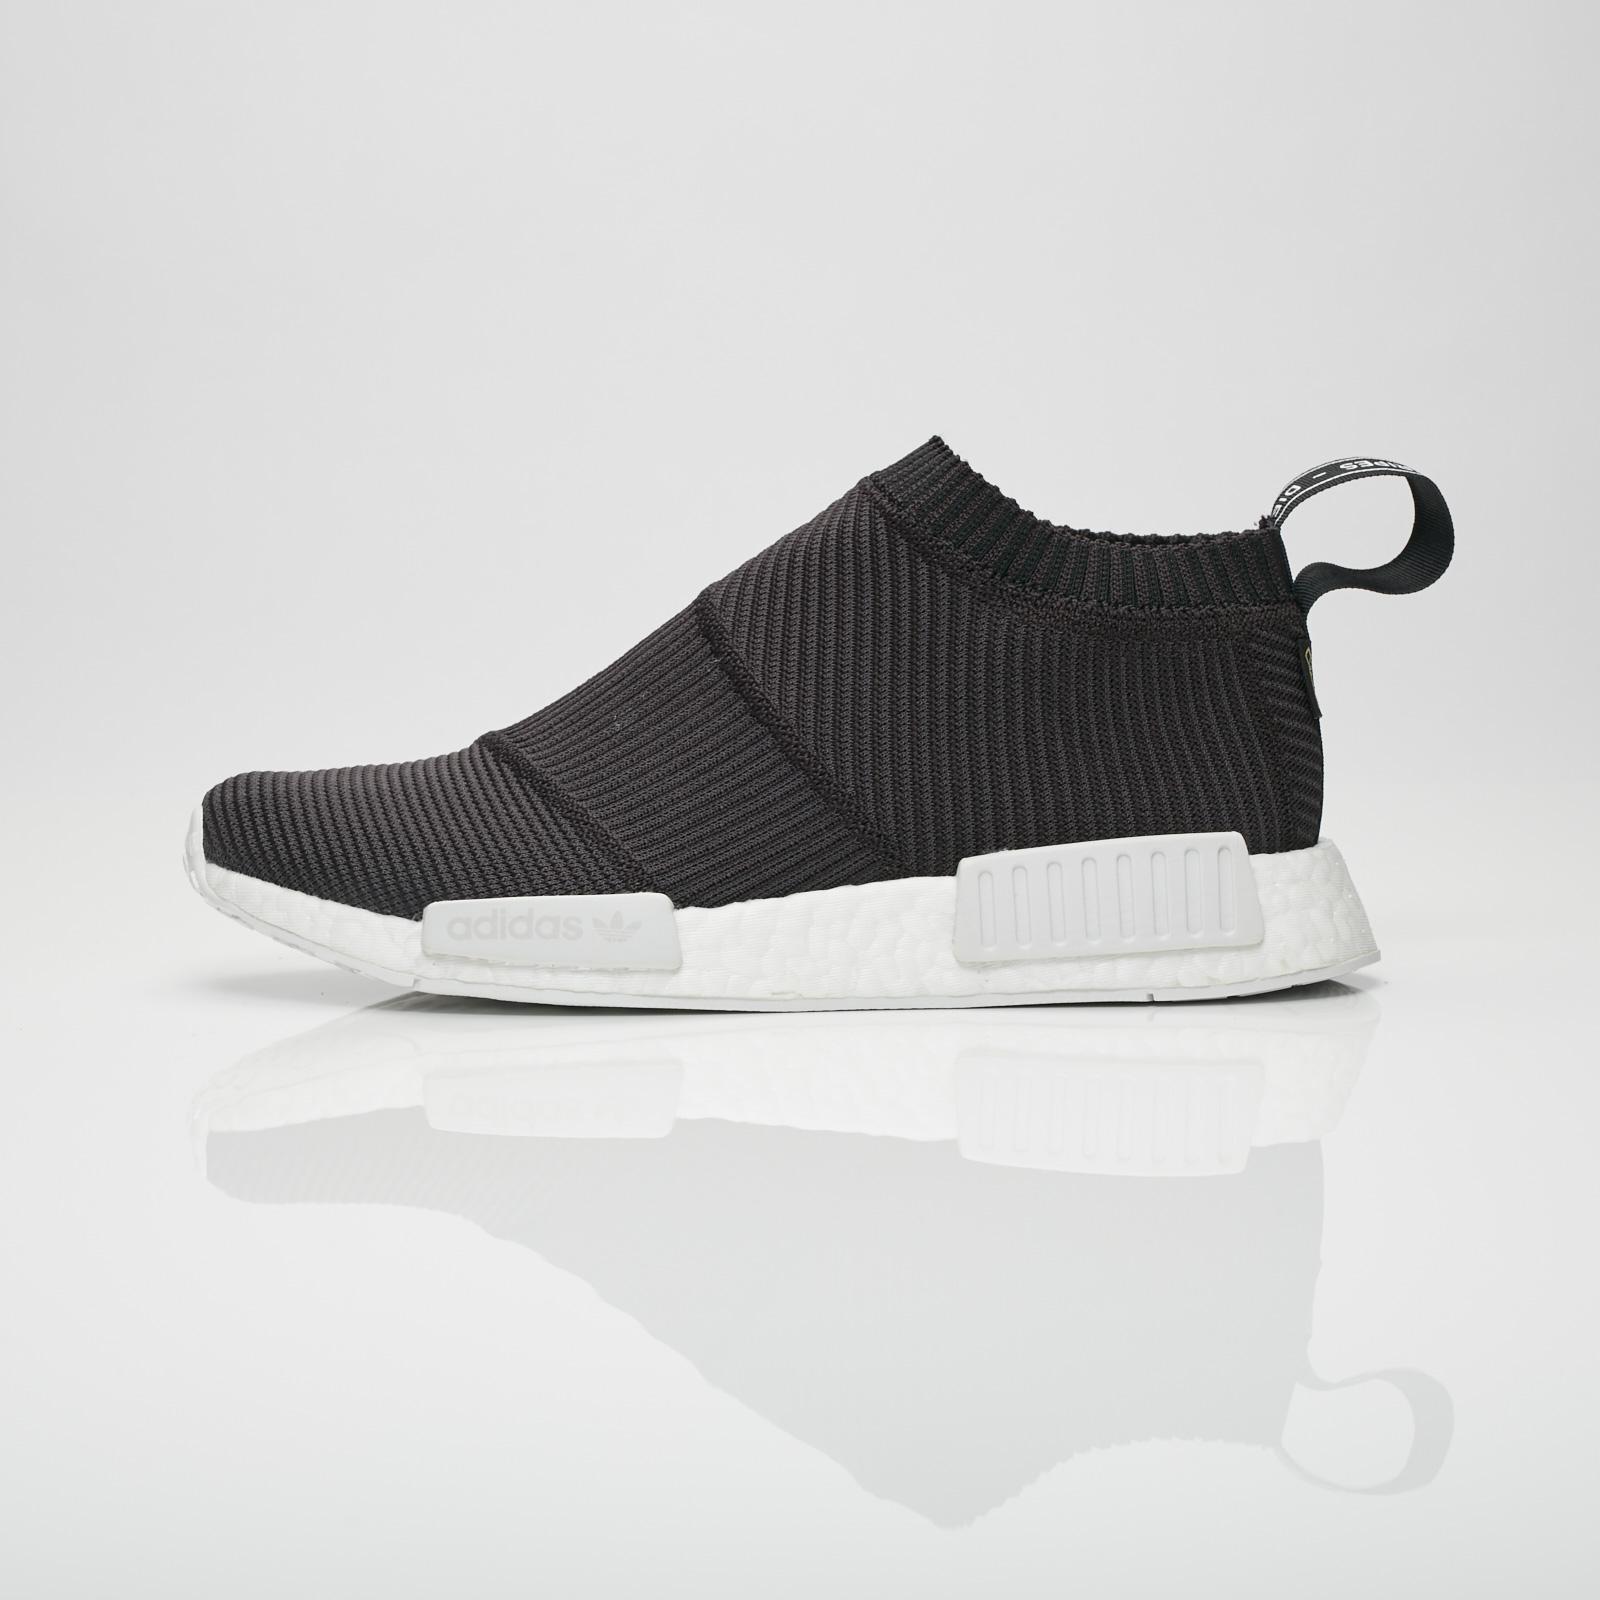 222f0c2b7 adidas NMD Gore-tex Primeknit - By9405 - Sneakersnstuff